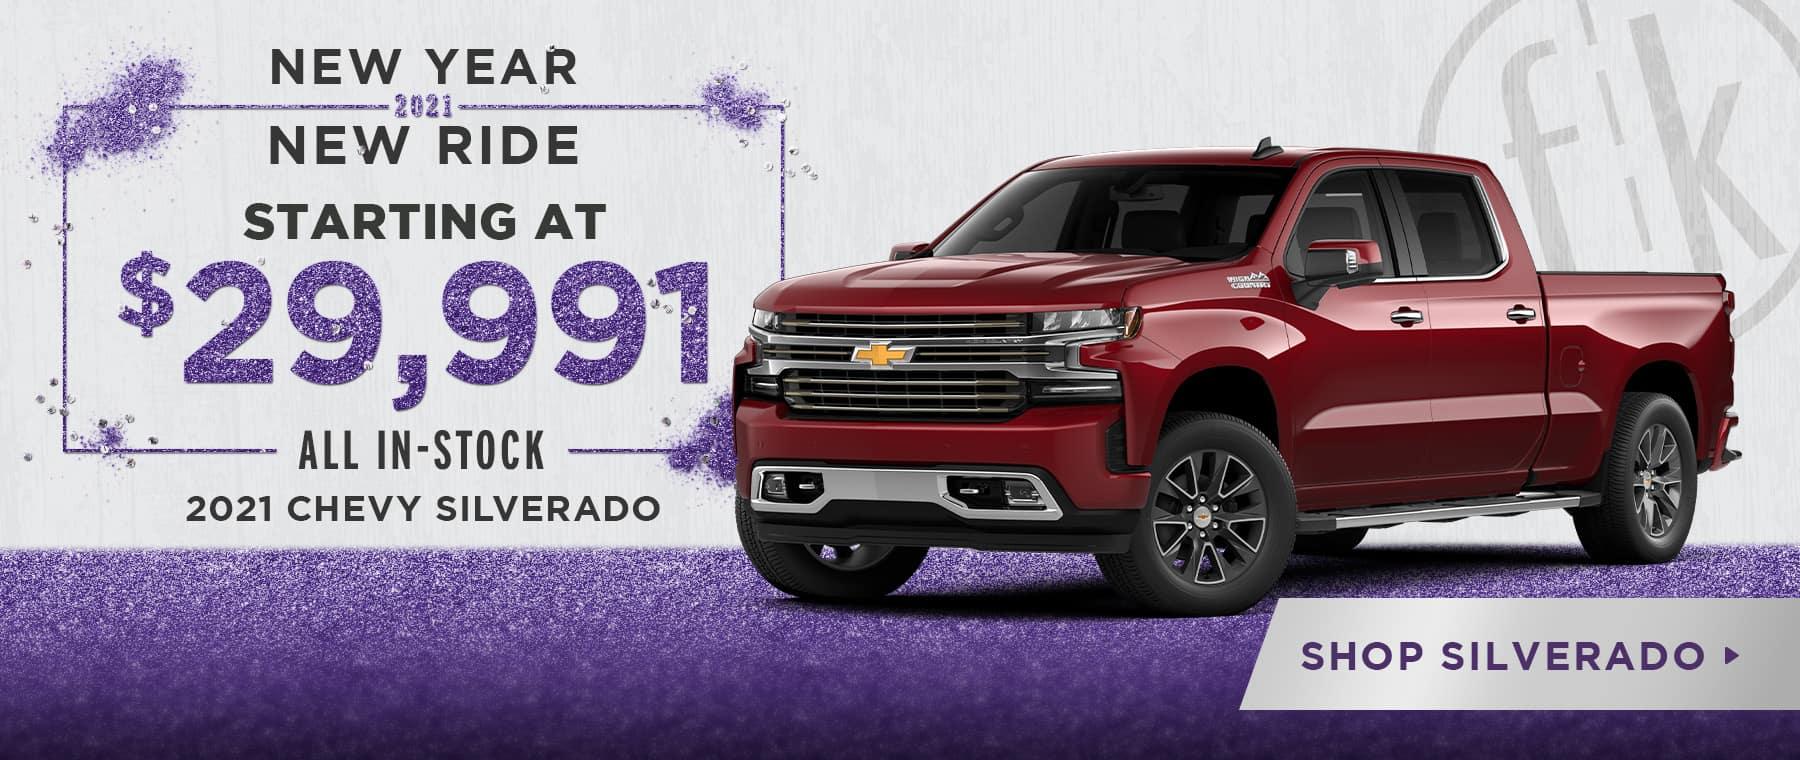 2021 Chevy Silverado Starting At $29,991